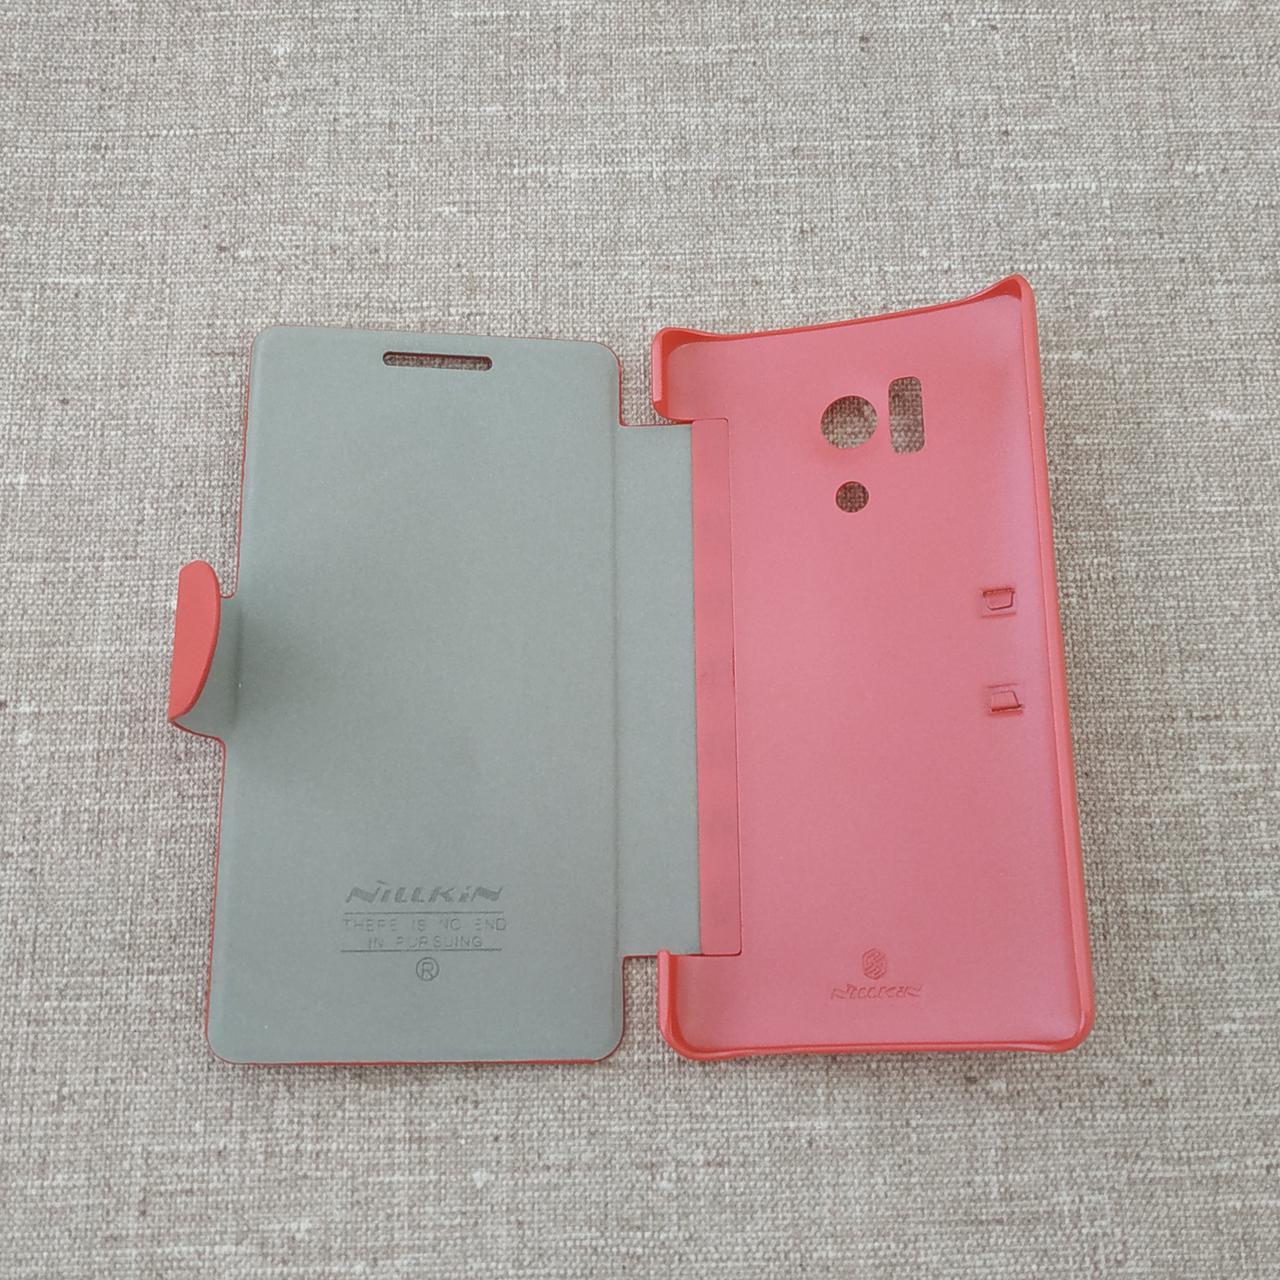 Nillkin Fresh Huawei Honor 3 red